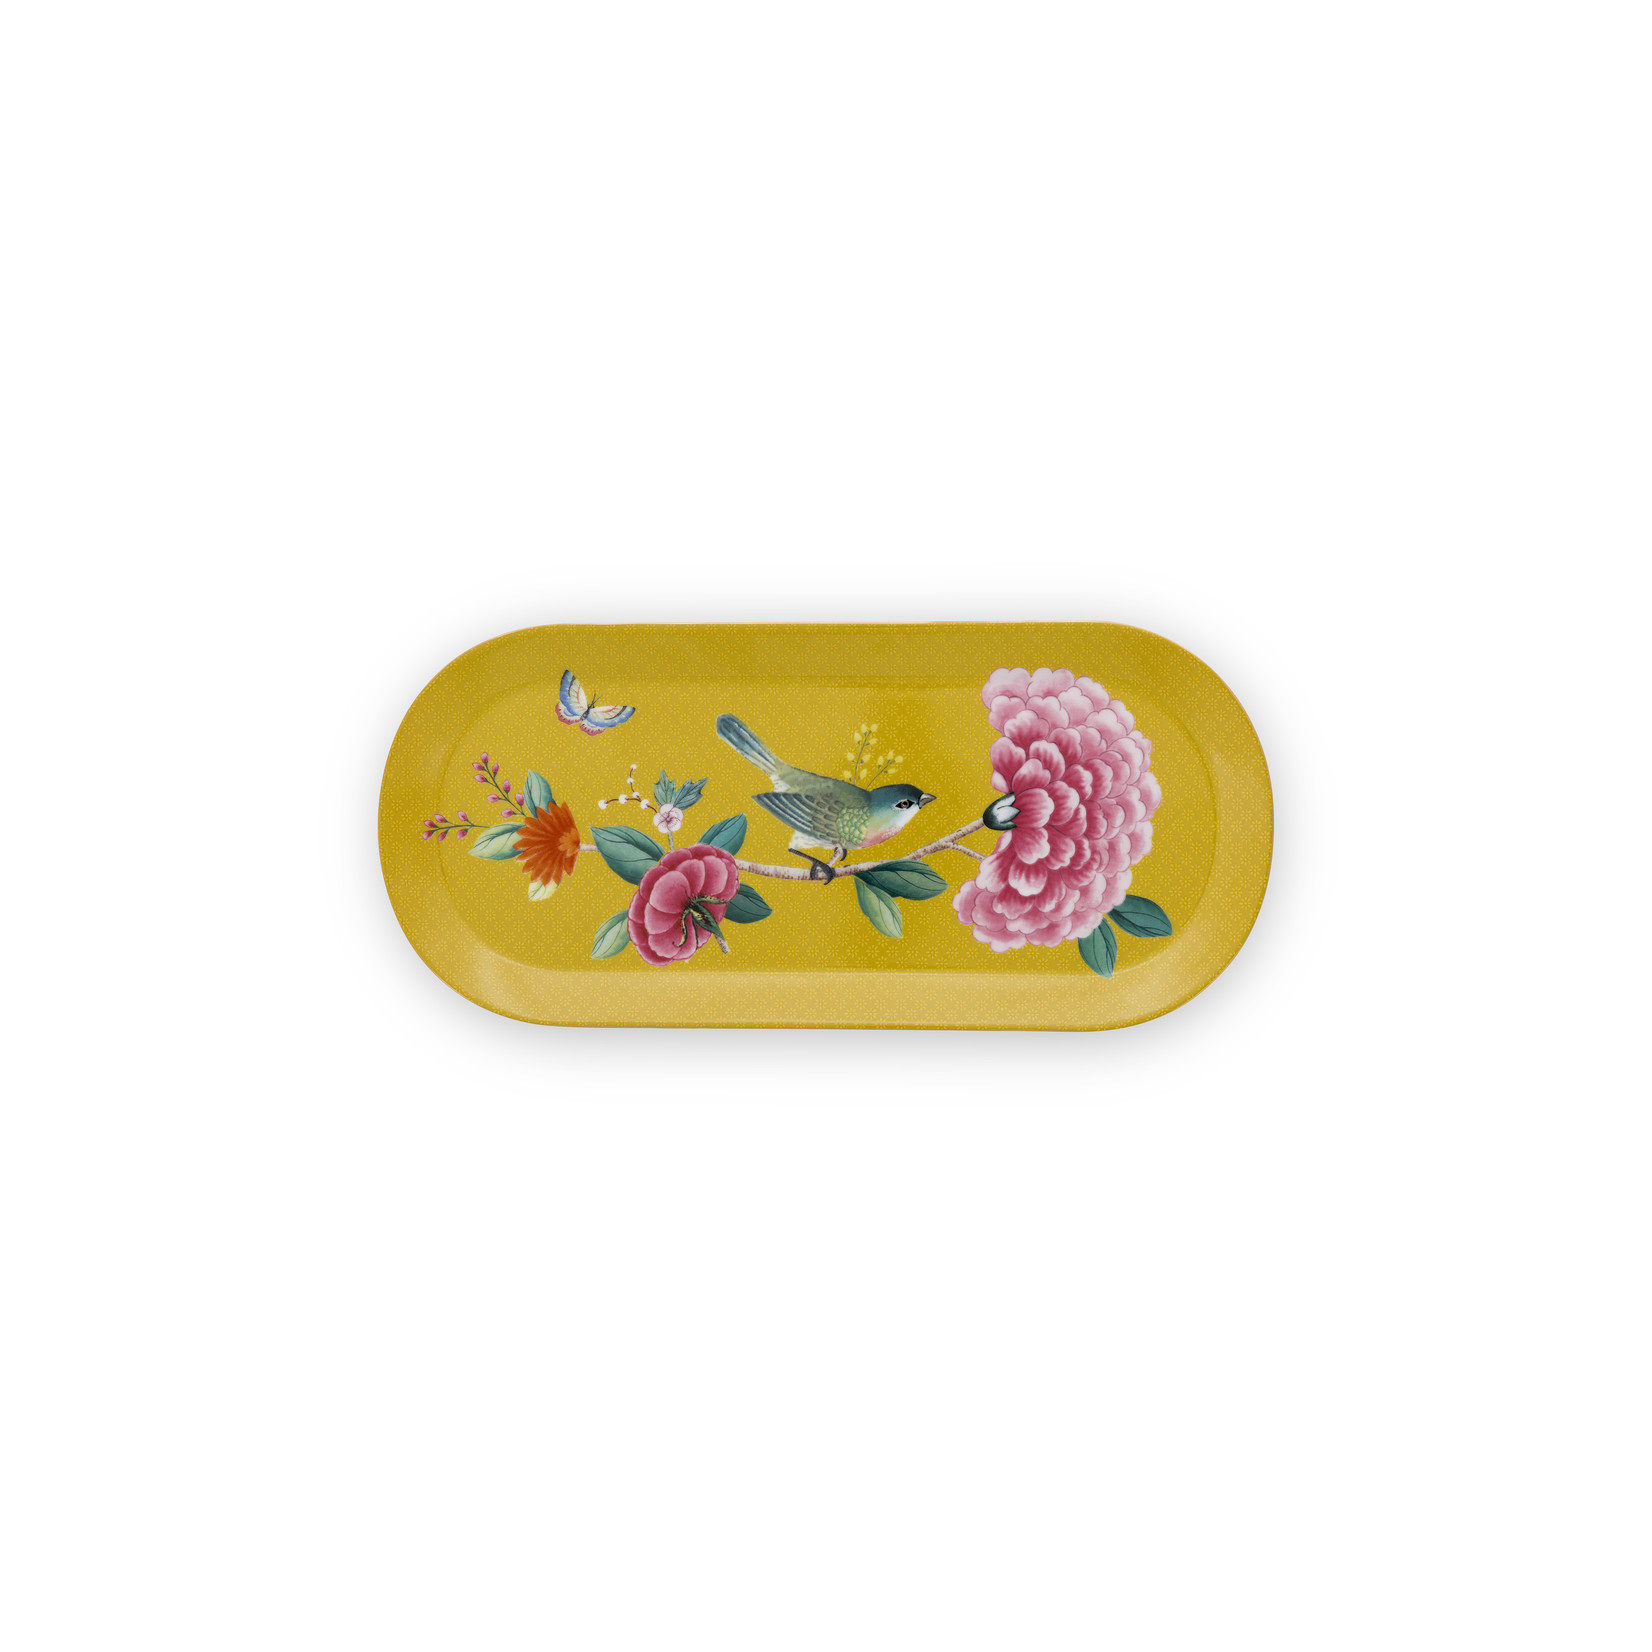 PIP Studio Cake Tray Rectangular Blushing Birds Yellow 33.3x15.5cm